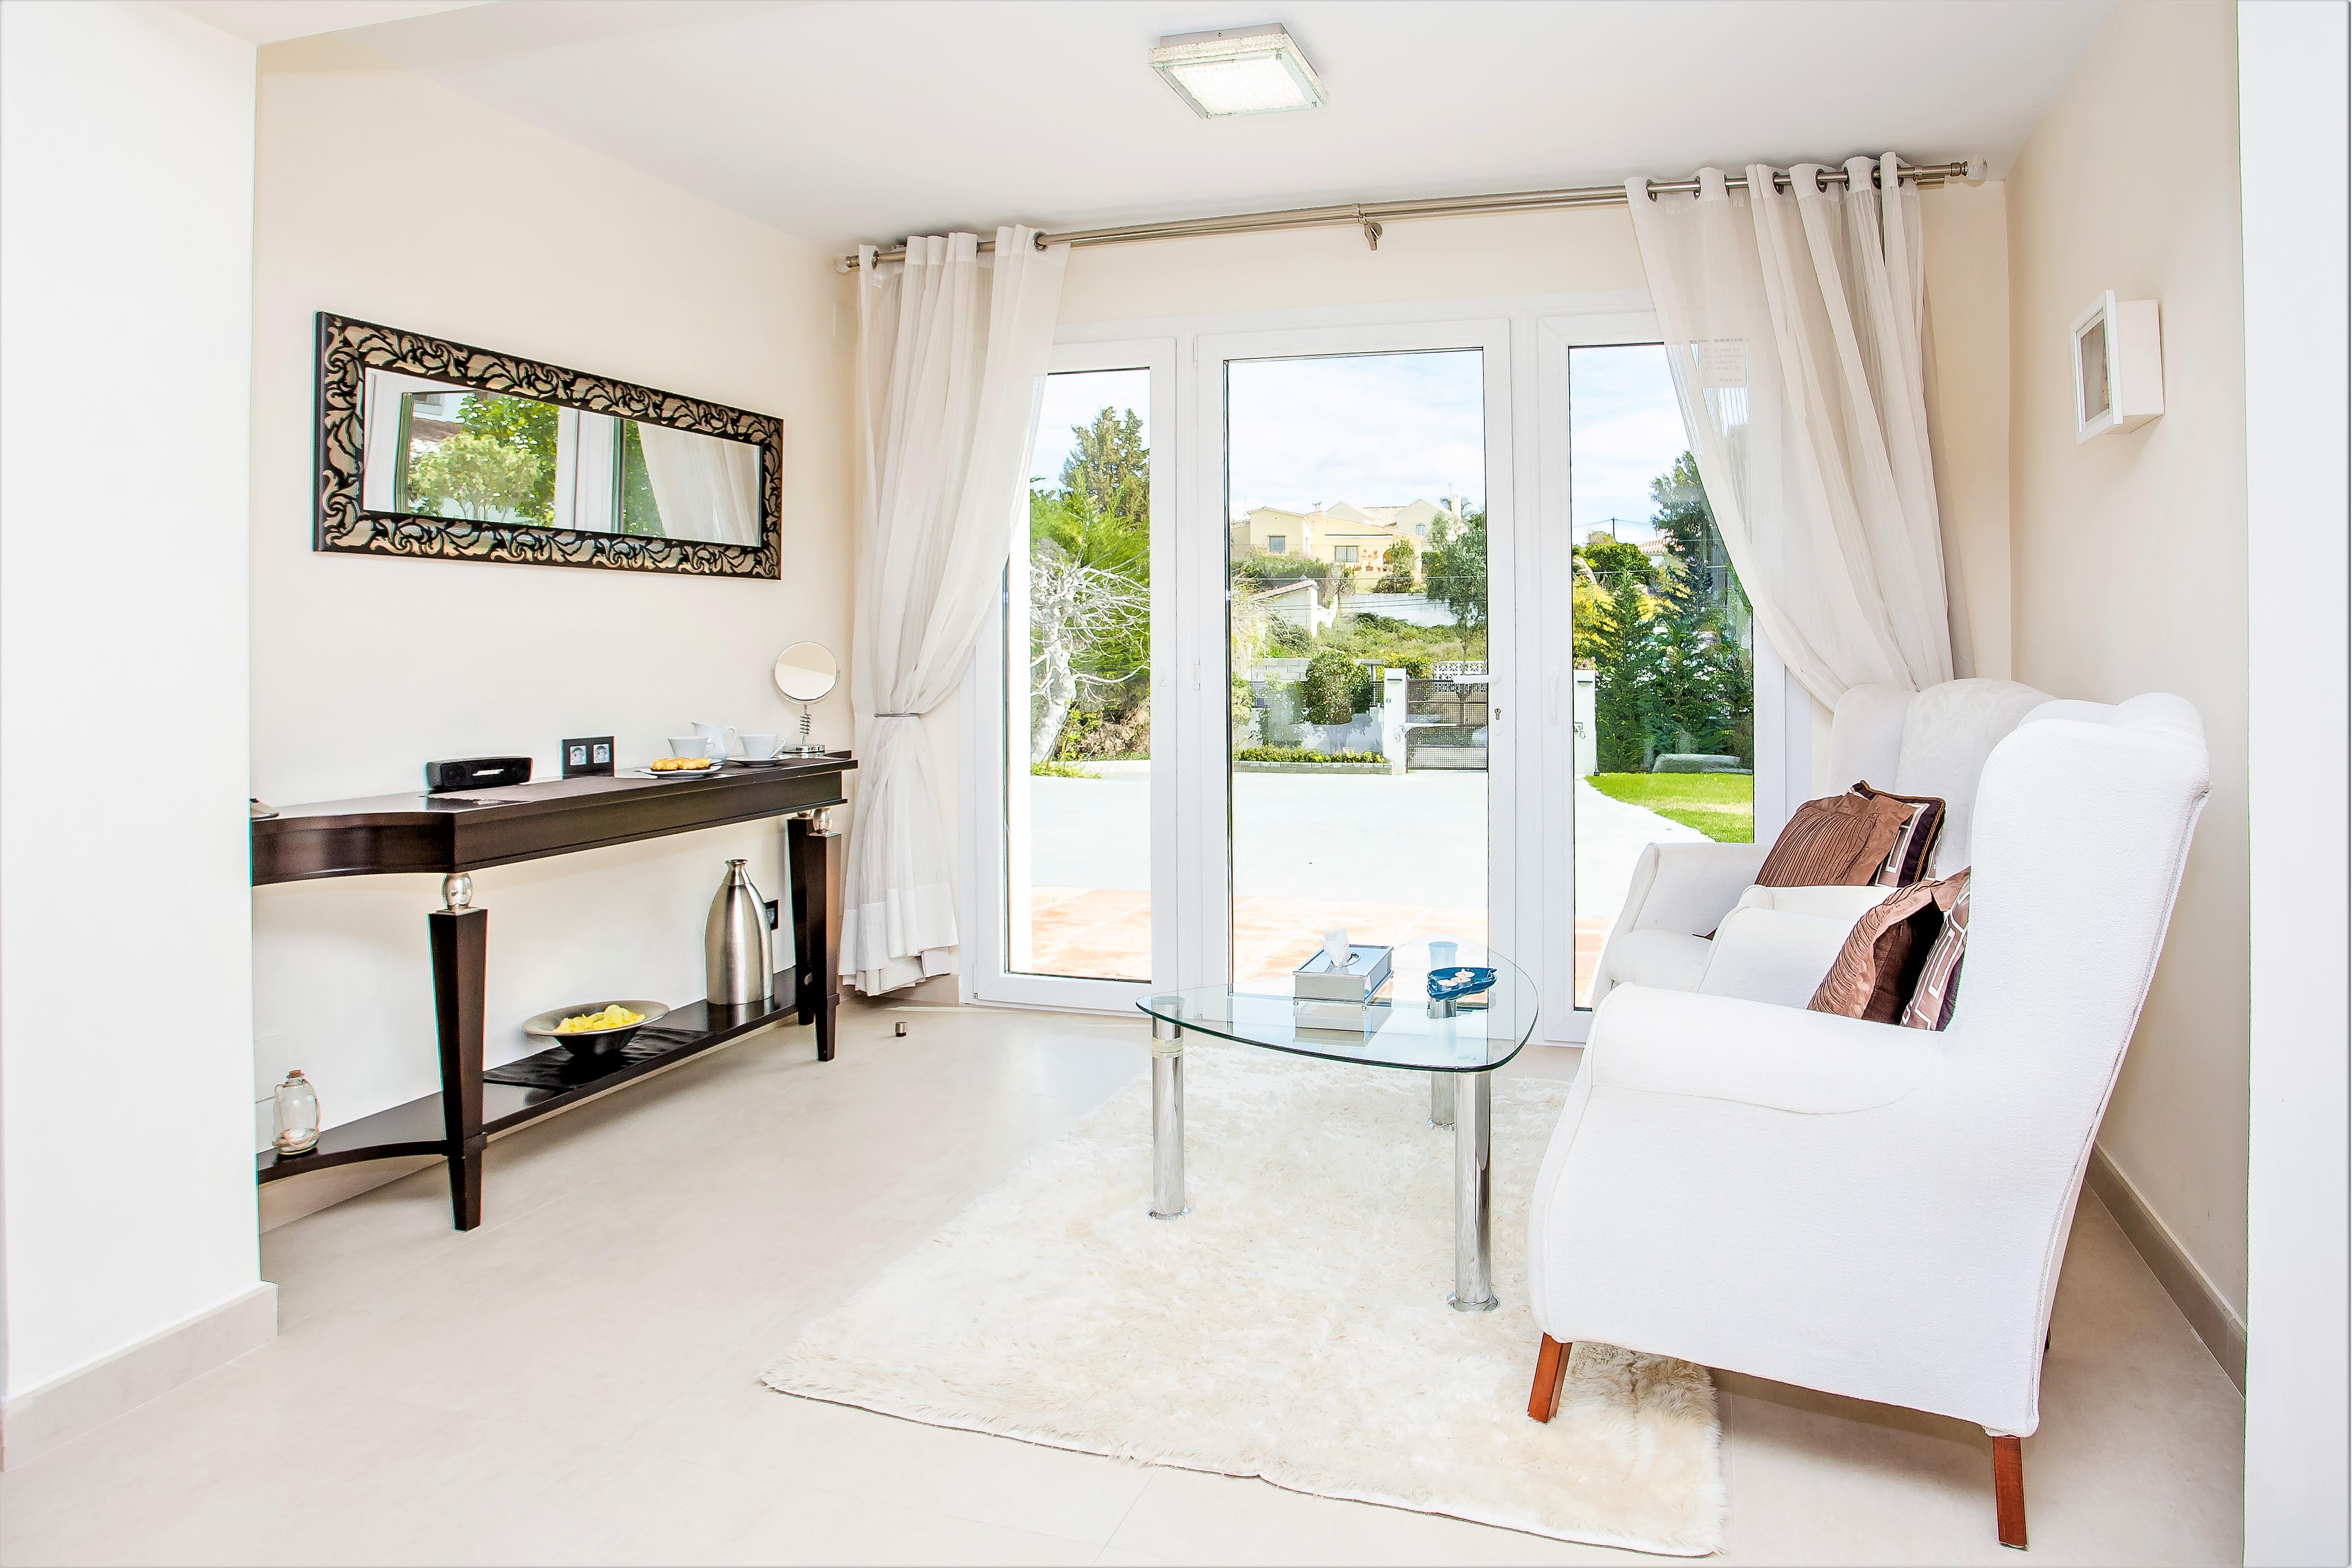 Apartment 8 Bedroom VILLA BY PUERTO BANUS   SEA 5 min                                photo 20402238